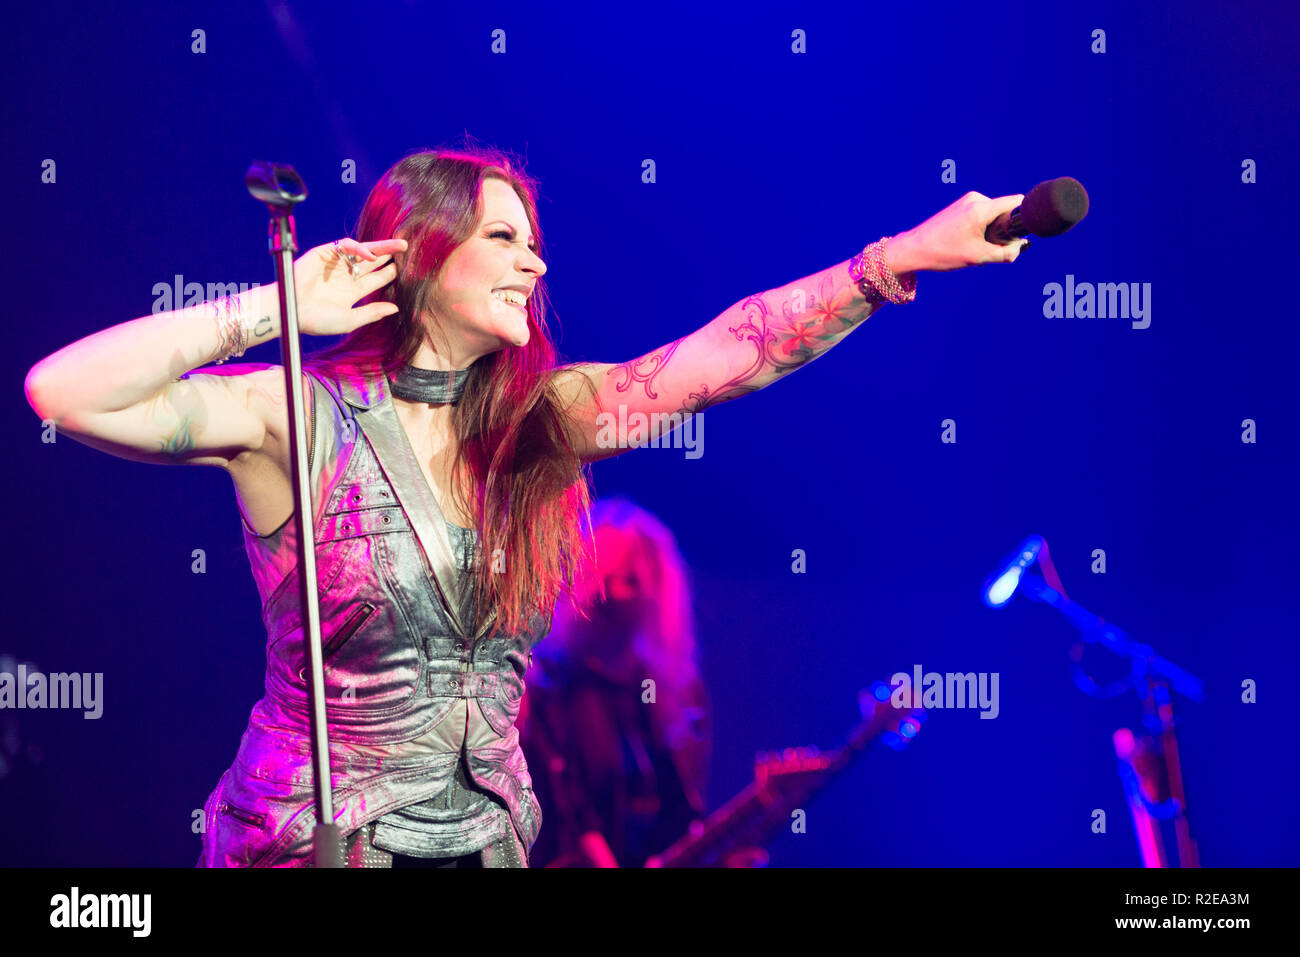 BRATISLAVA, SLOVAKIA - NOV 13, 2018: Floor Jansen - vocalist of Nightwish, the Finnish symphonic metal band, performs a live concert at the Decades: E - Stock Image